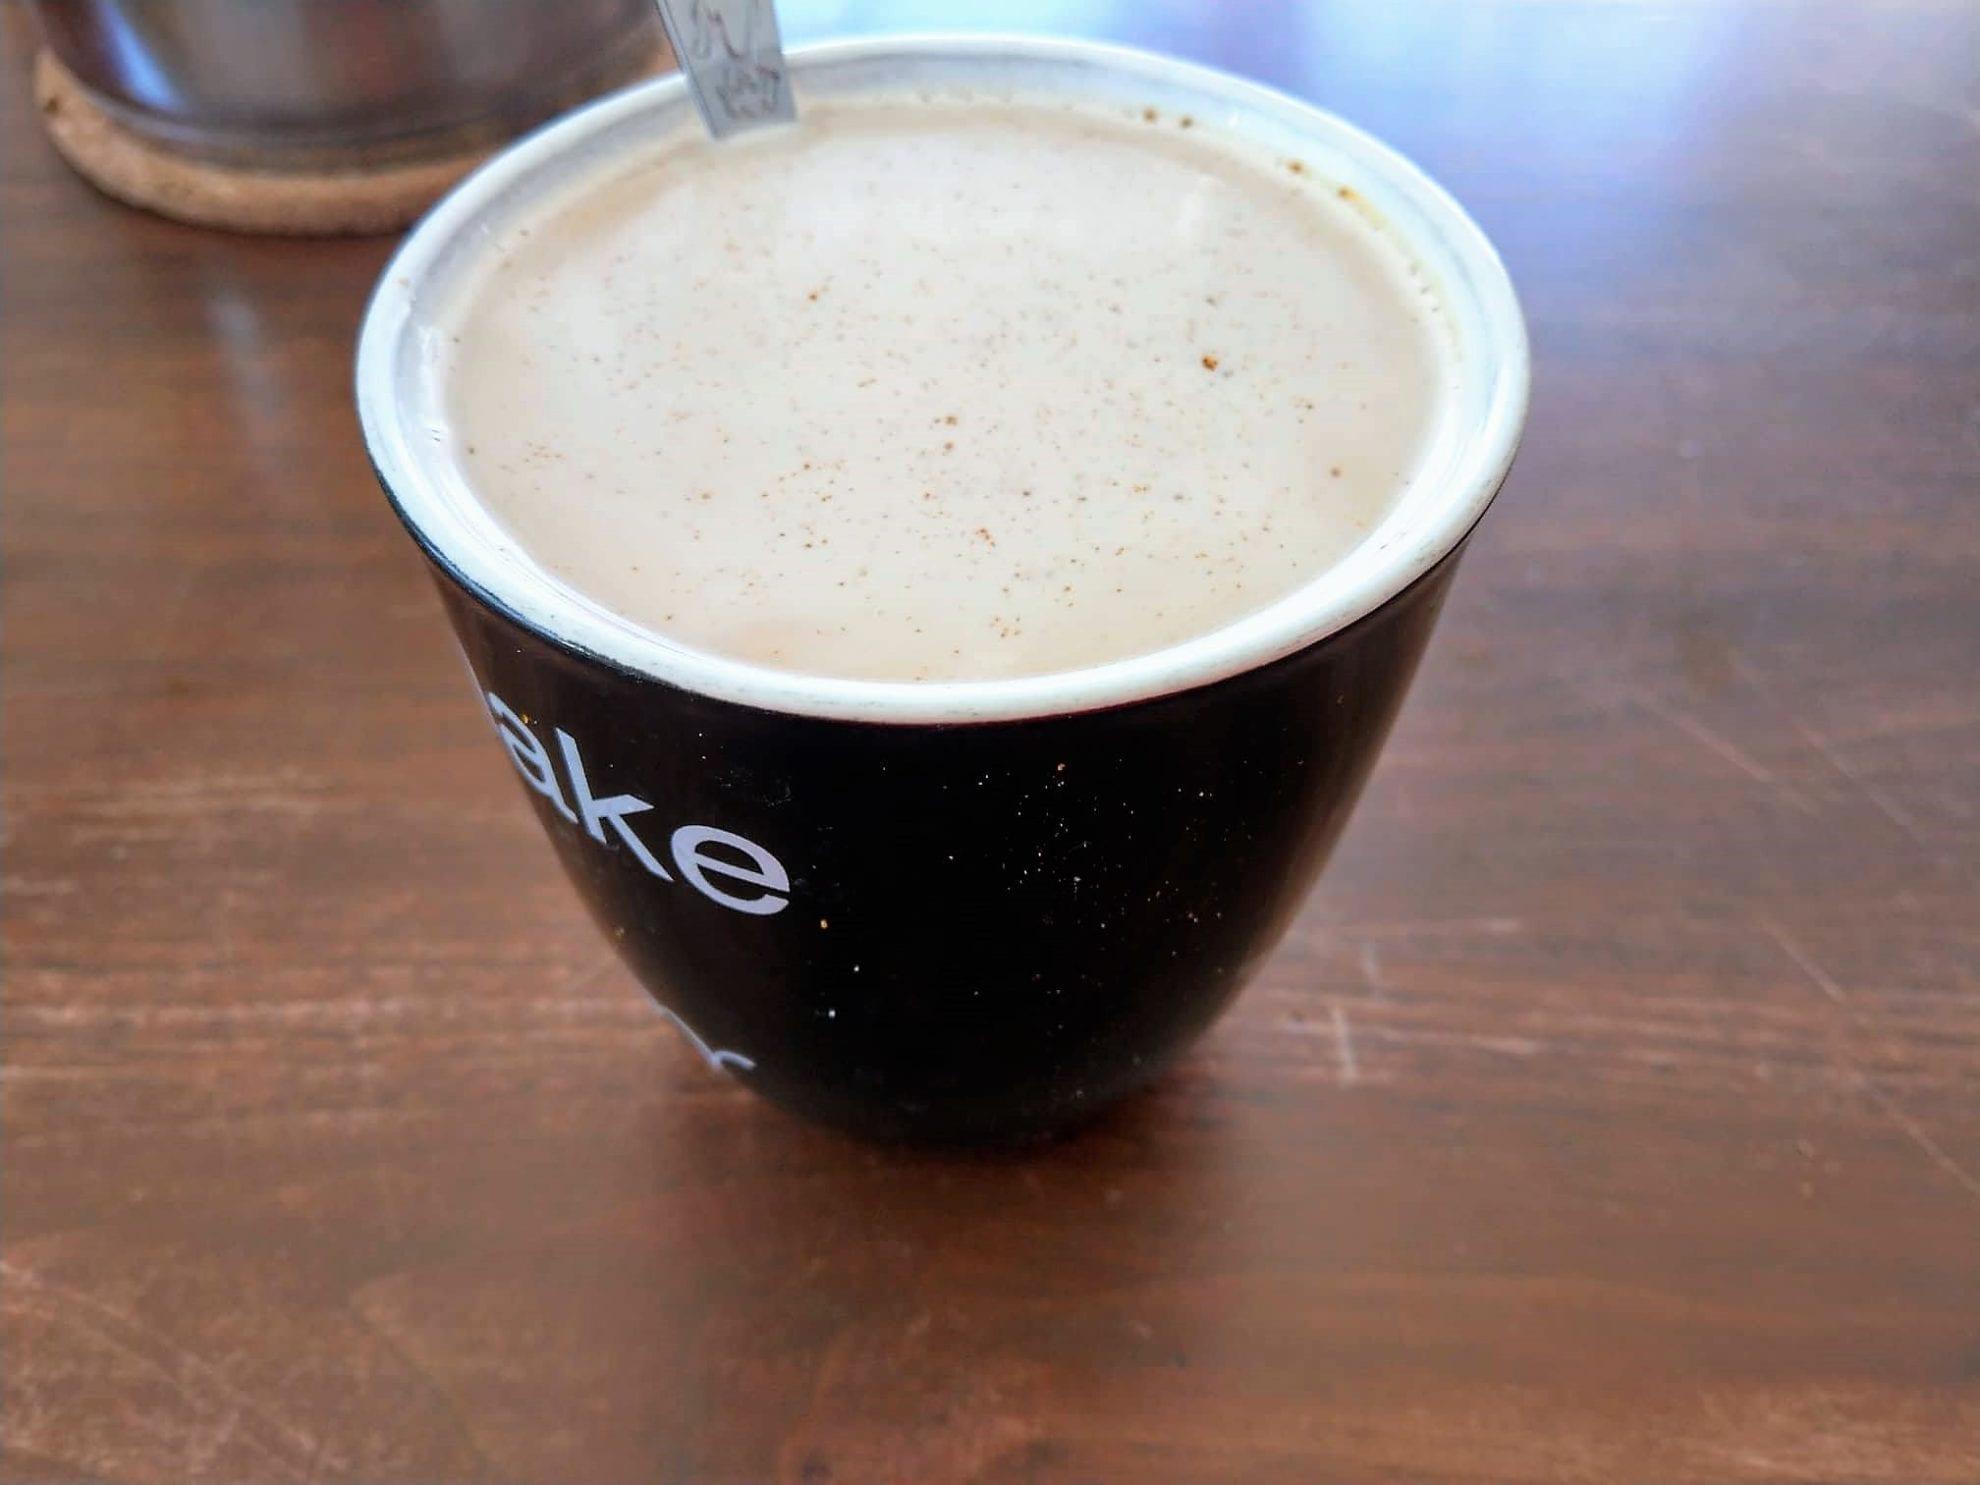 12 von 12 im September 2018, Kaffee, Kaffeetasse, Mittagspause